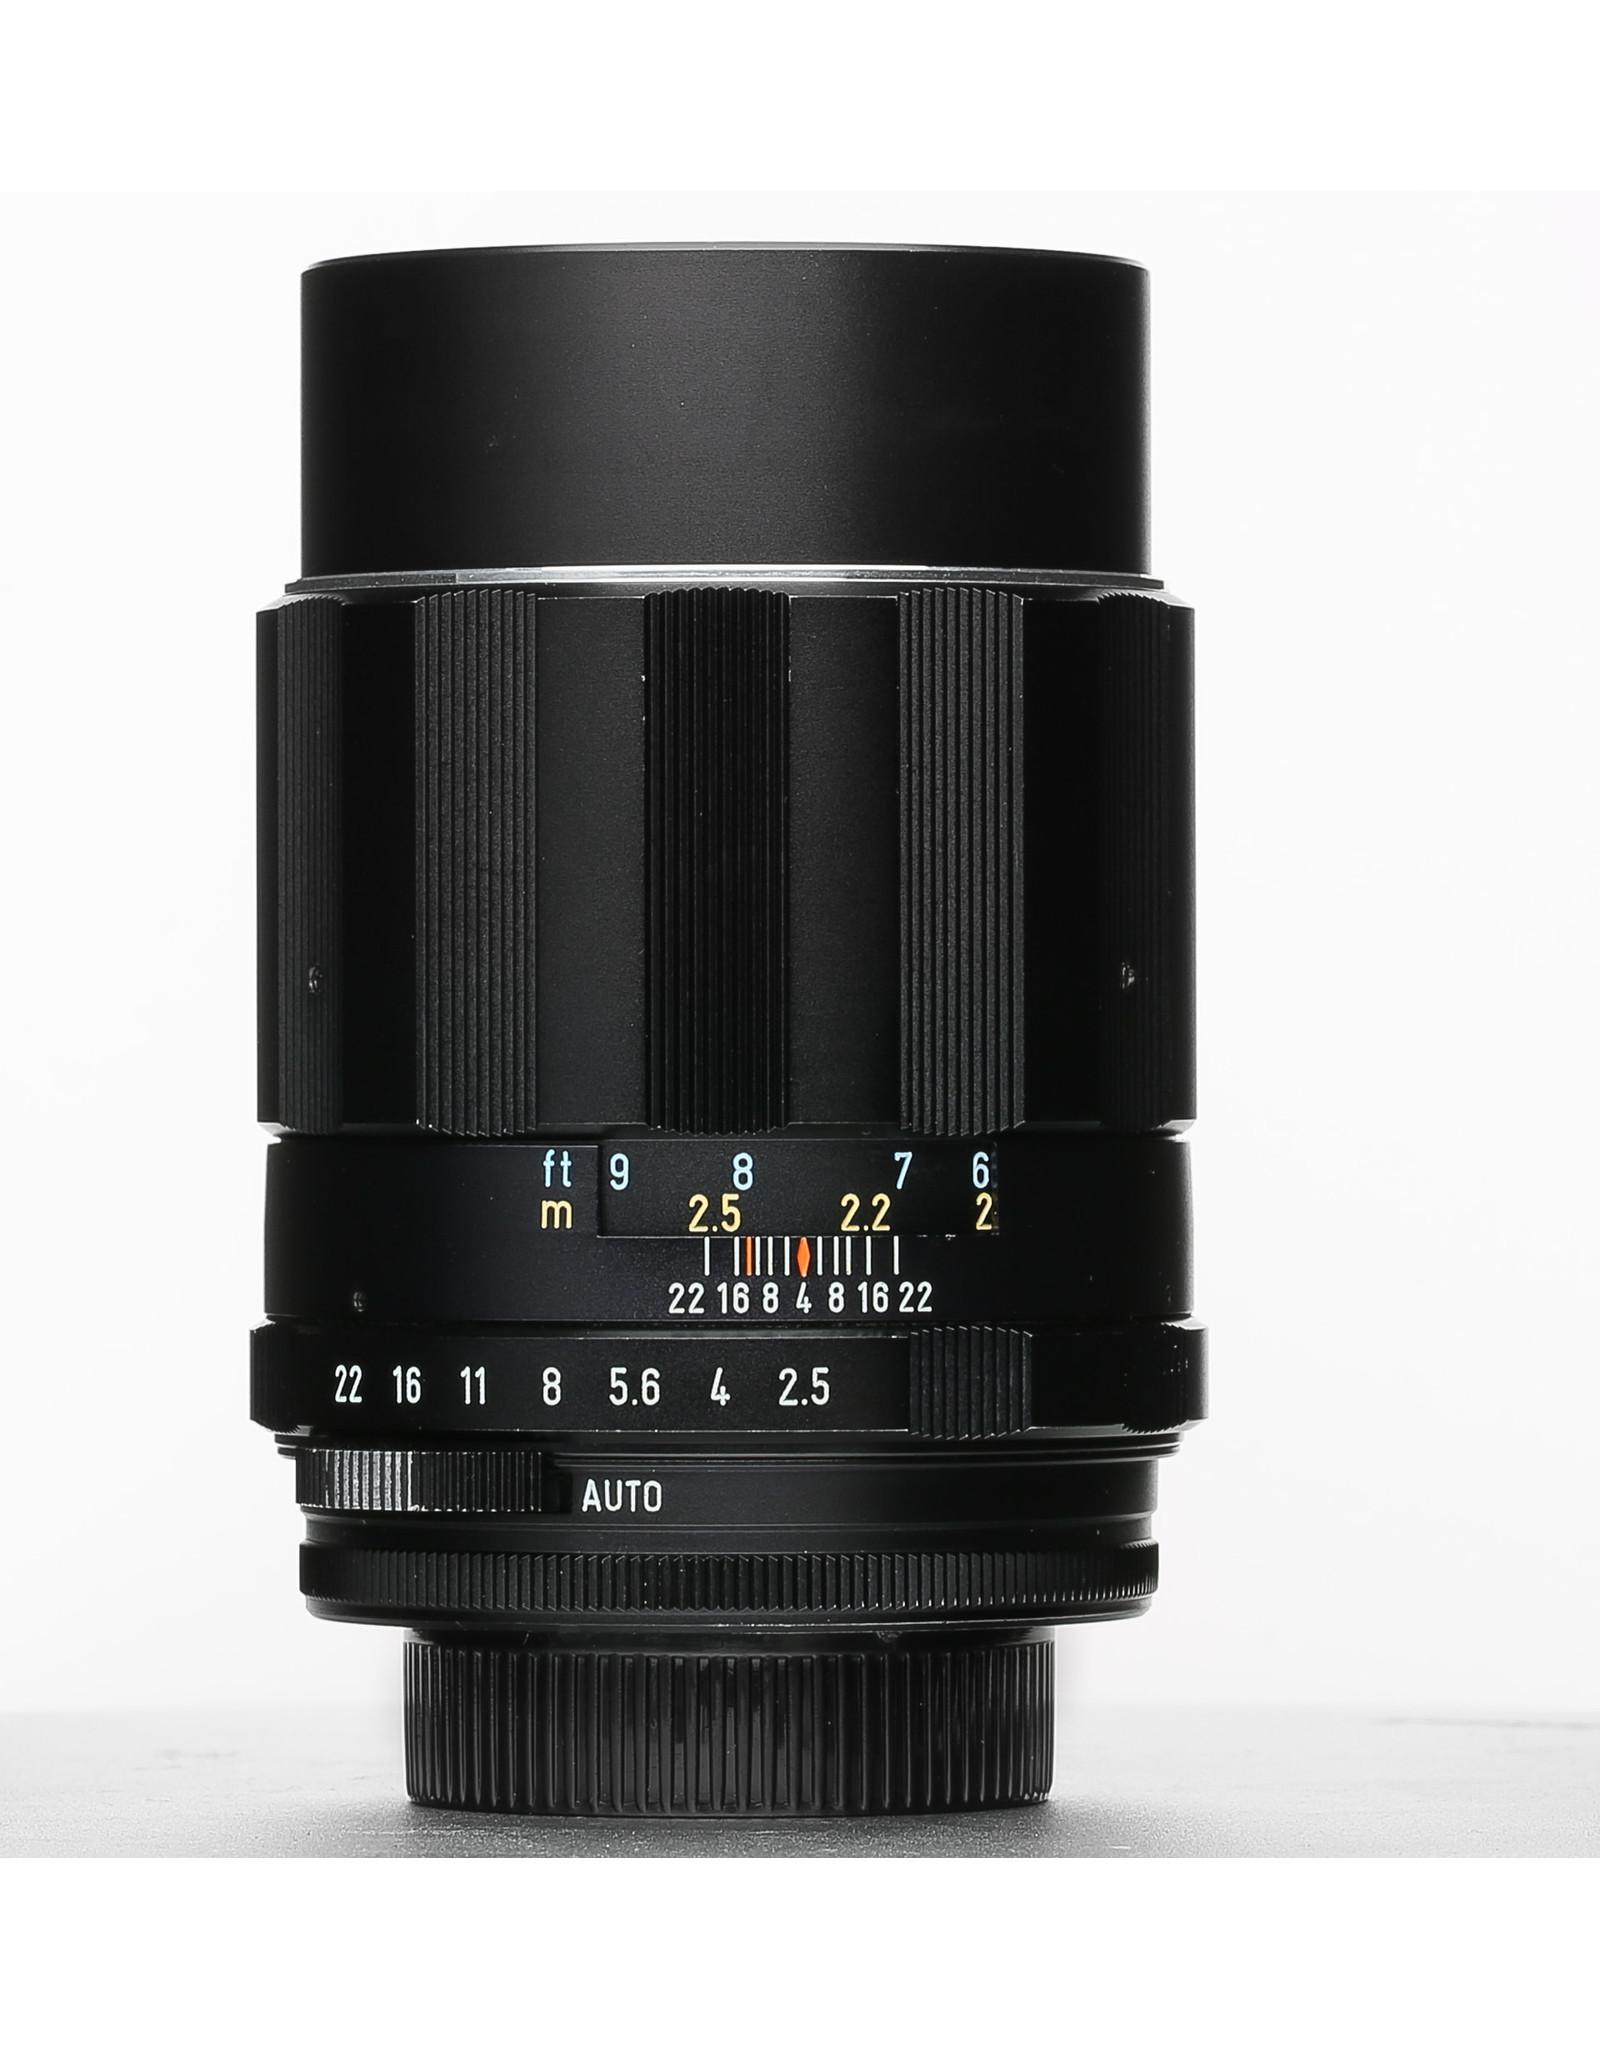 Pentax Pentax Super Multi Coated Takumar 135mm f/2.5 Lens M42 (6 elements)